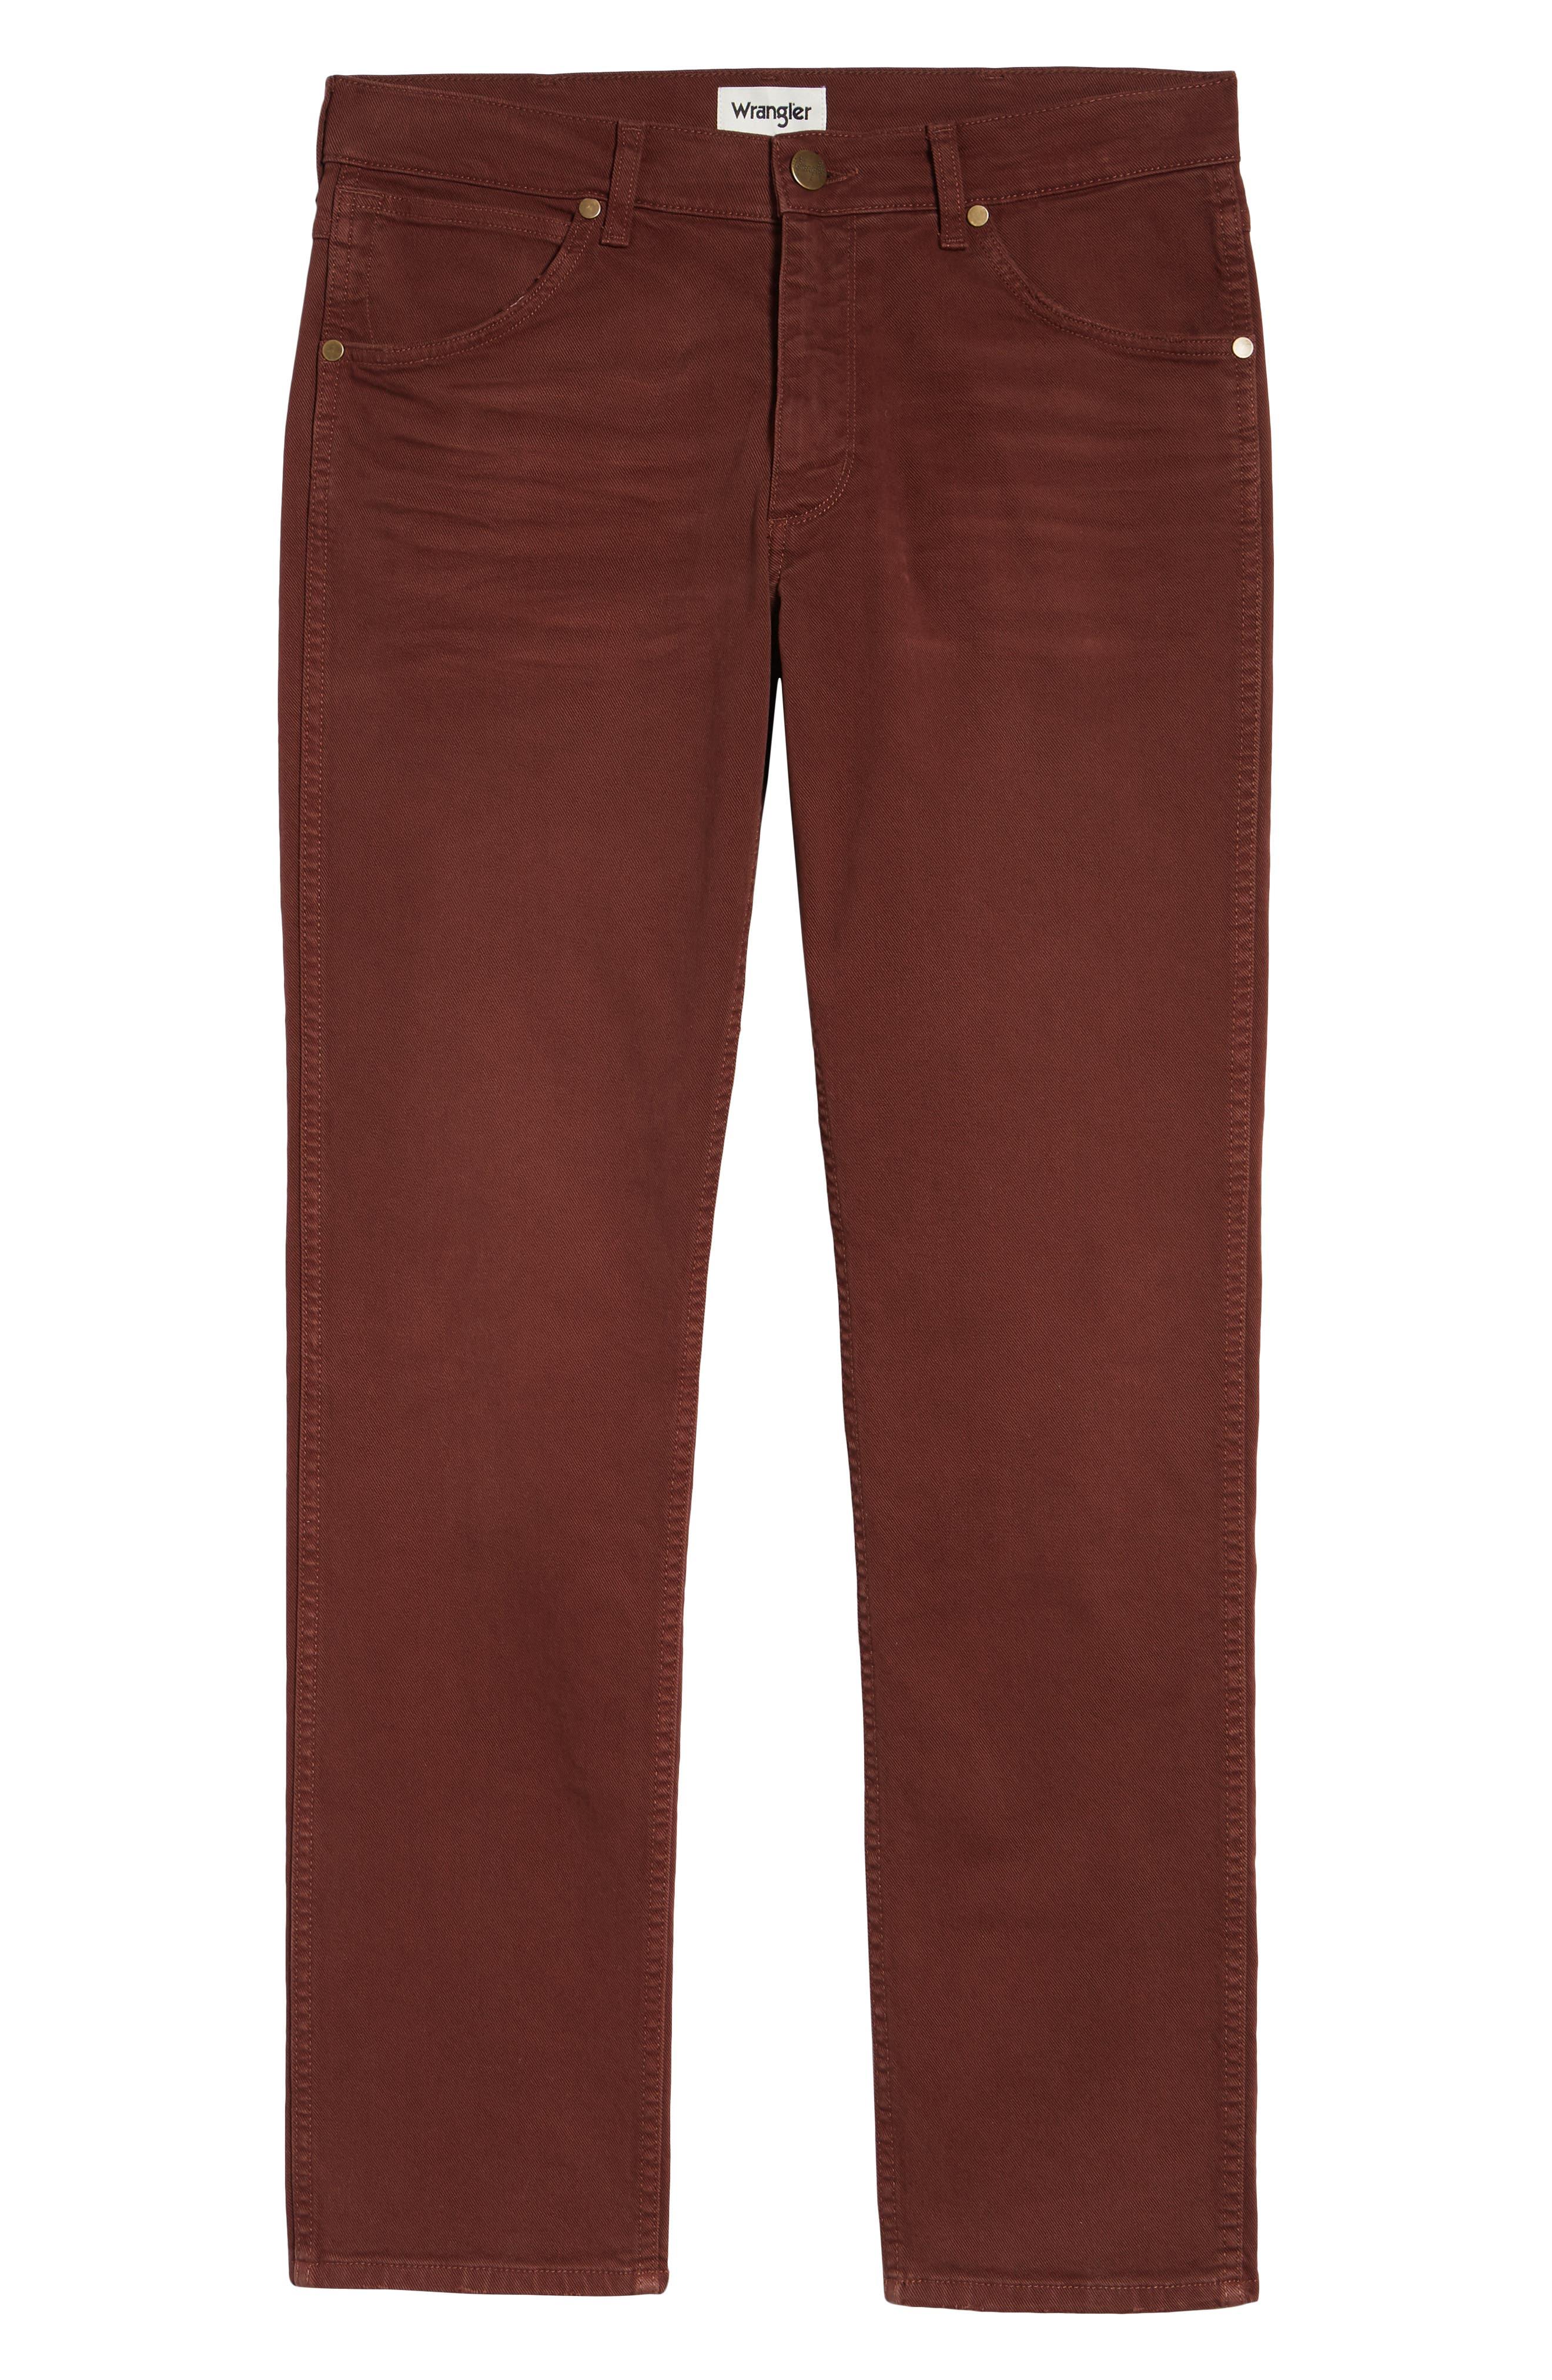 Greensboro Straight Leg Twill Pants,                             Alternate thumbnail 6, color,                             MAHOGANY RED